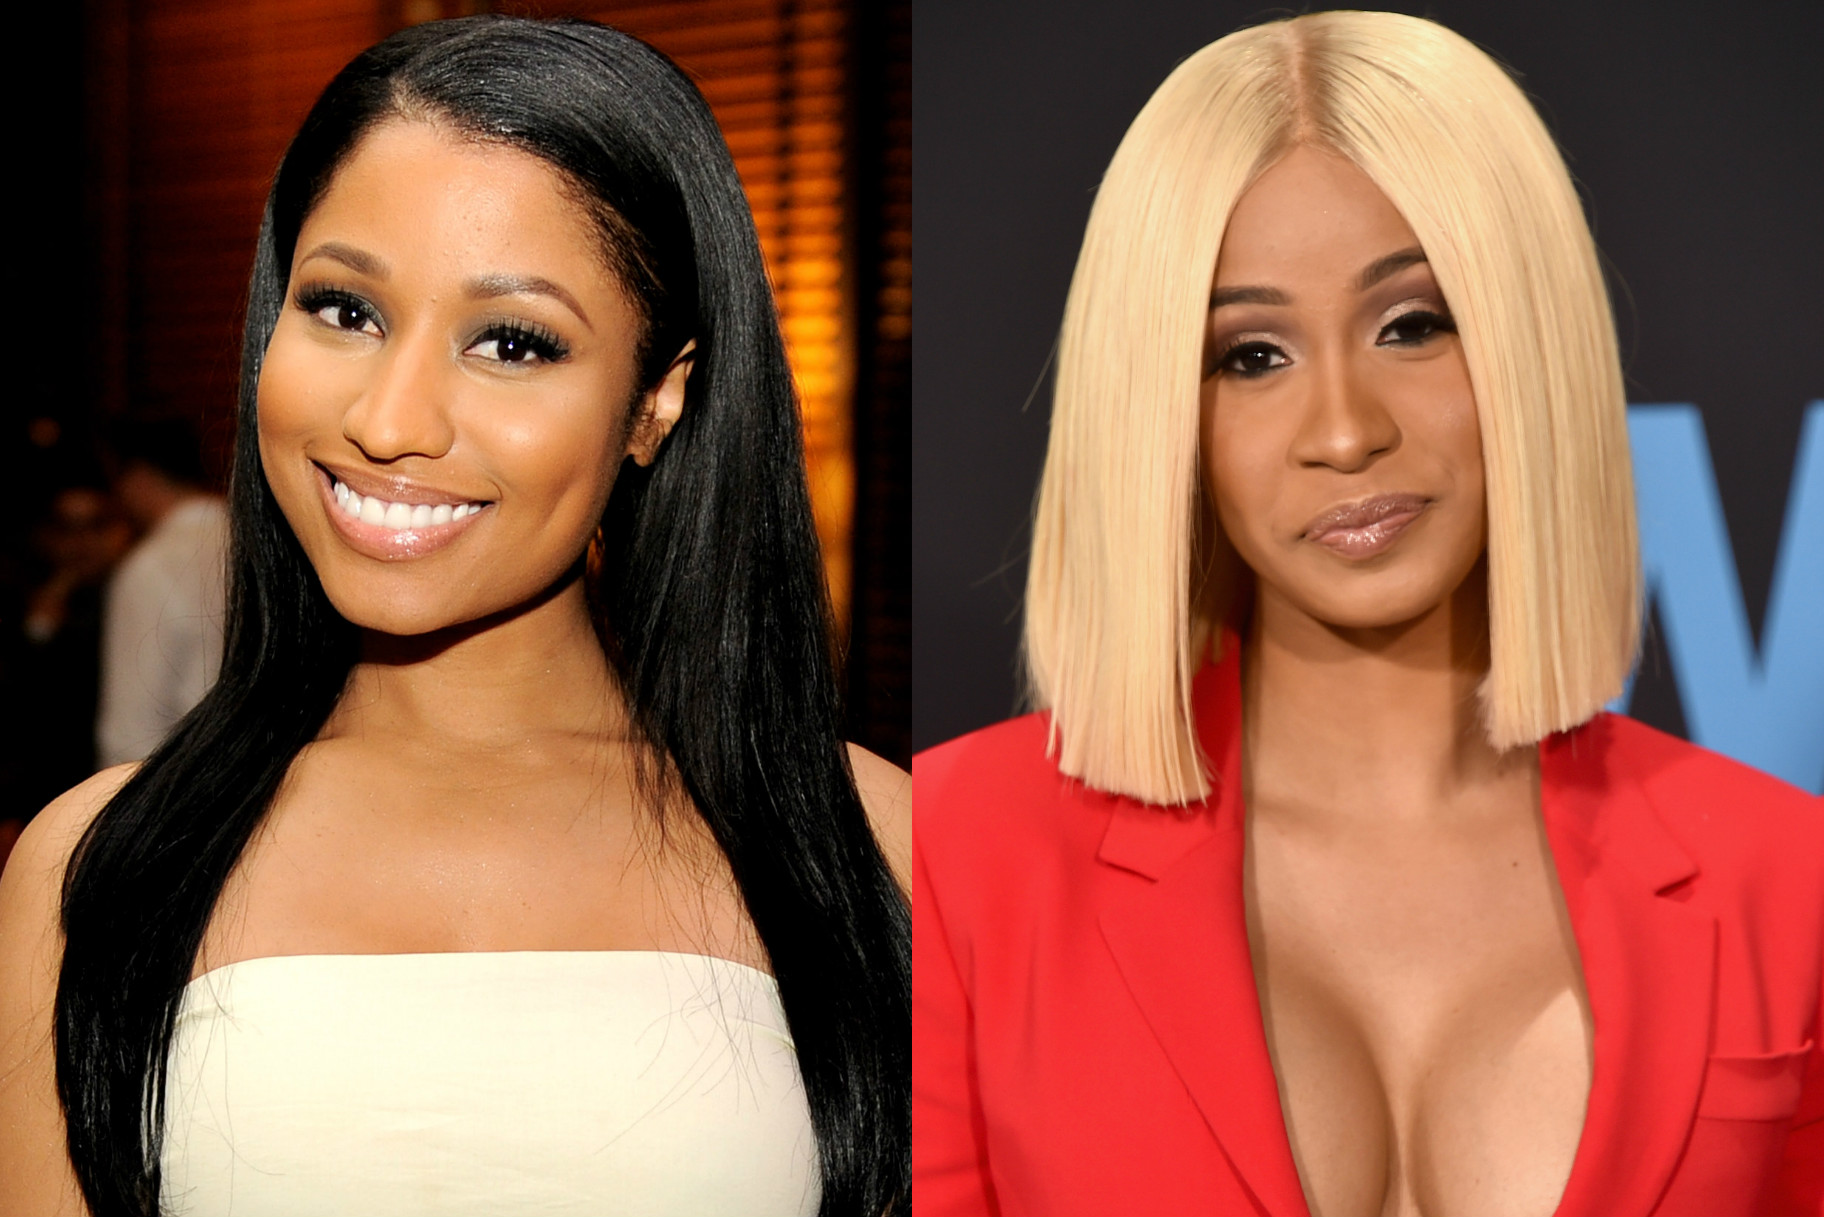 Why Did Cardi B And Offset Name Their Baby Kulture Kiari: Nicki Minaj Just Killed Rumors That She's Beefing With